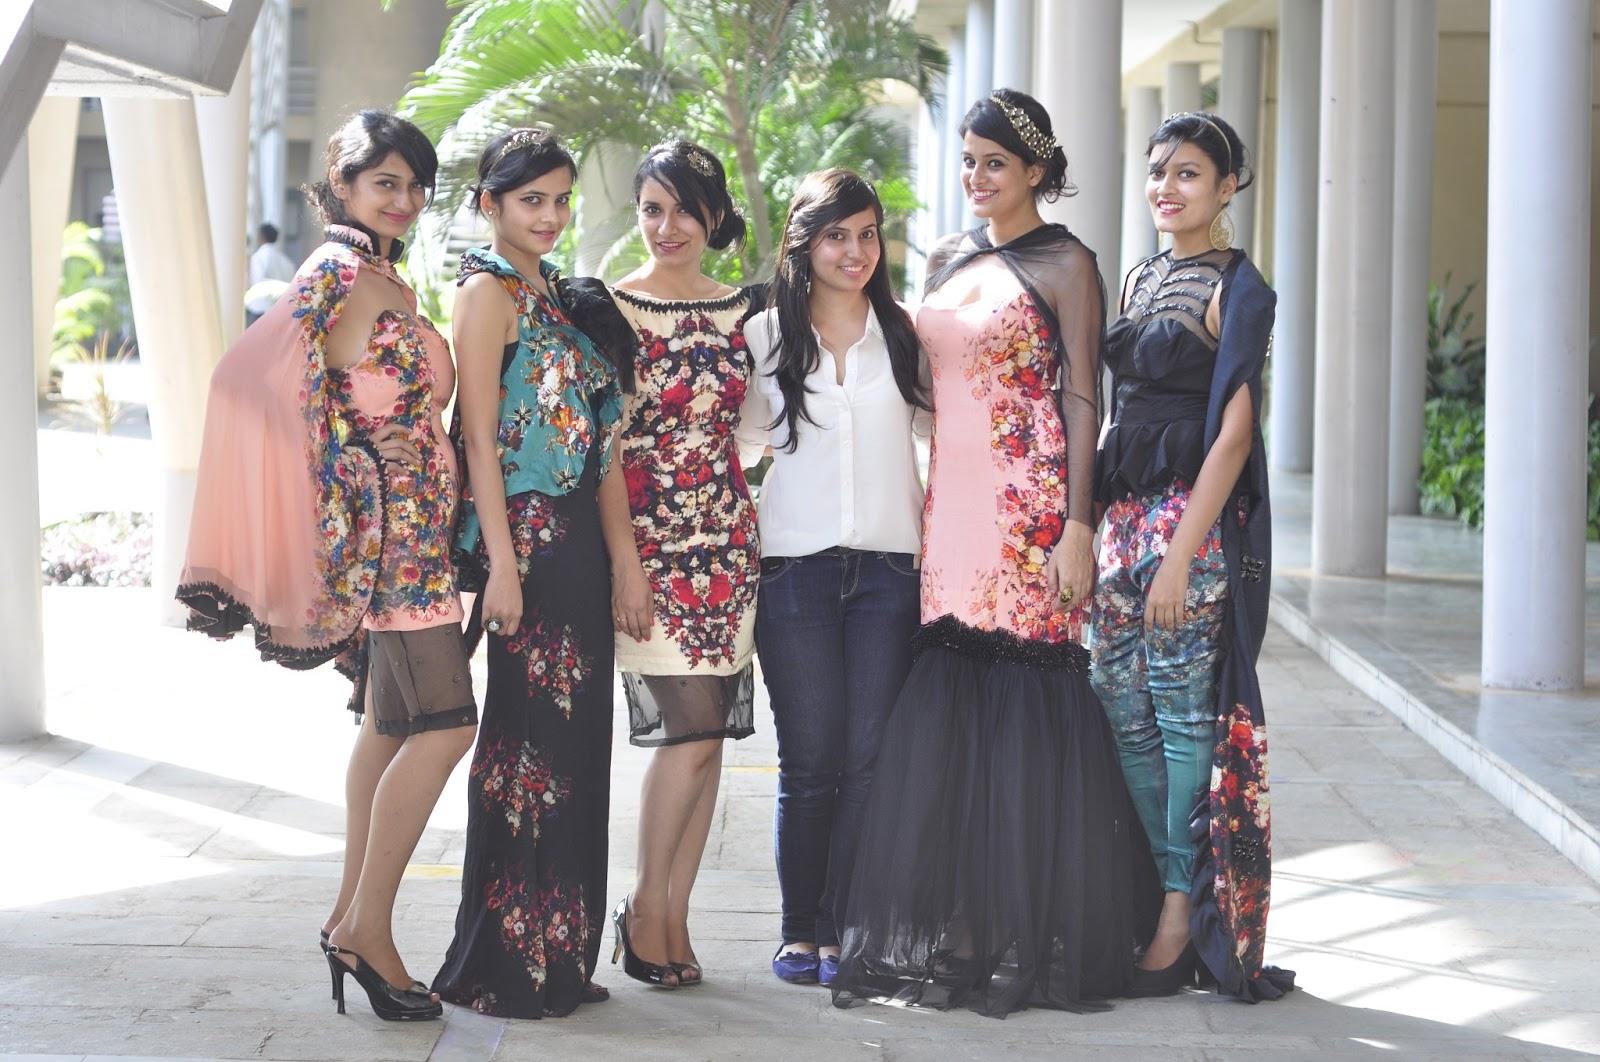 Dinesh Kamath Dinesh Kamath S News Item Nift Mumbai S Fashion Design Jury Day 2013 That Was Published In Newsband